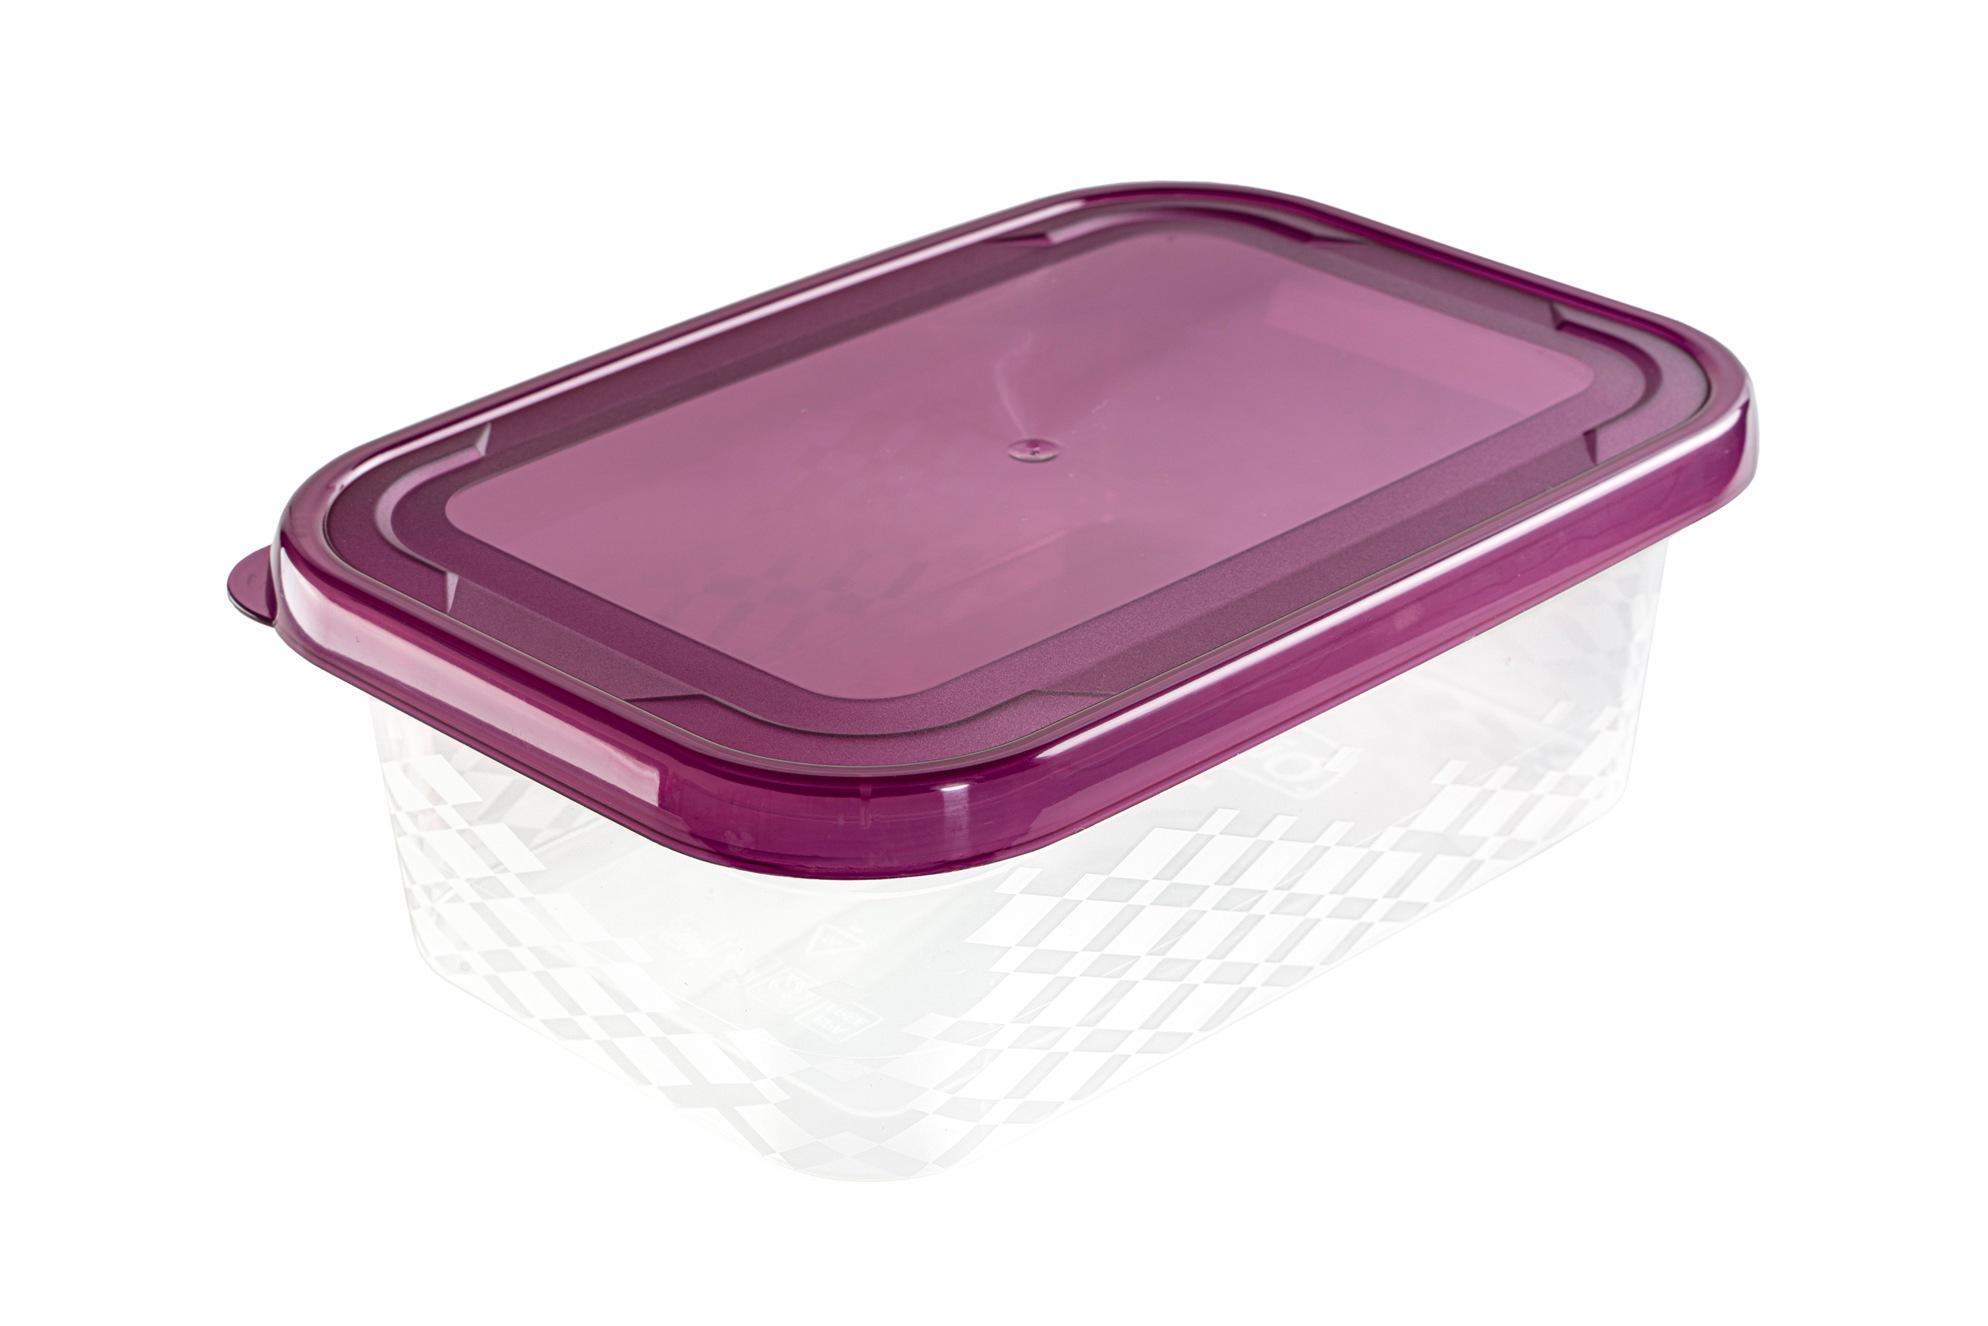 Branq Sada dóz na potraviny Ori purple 5ks - obdelníková